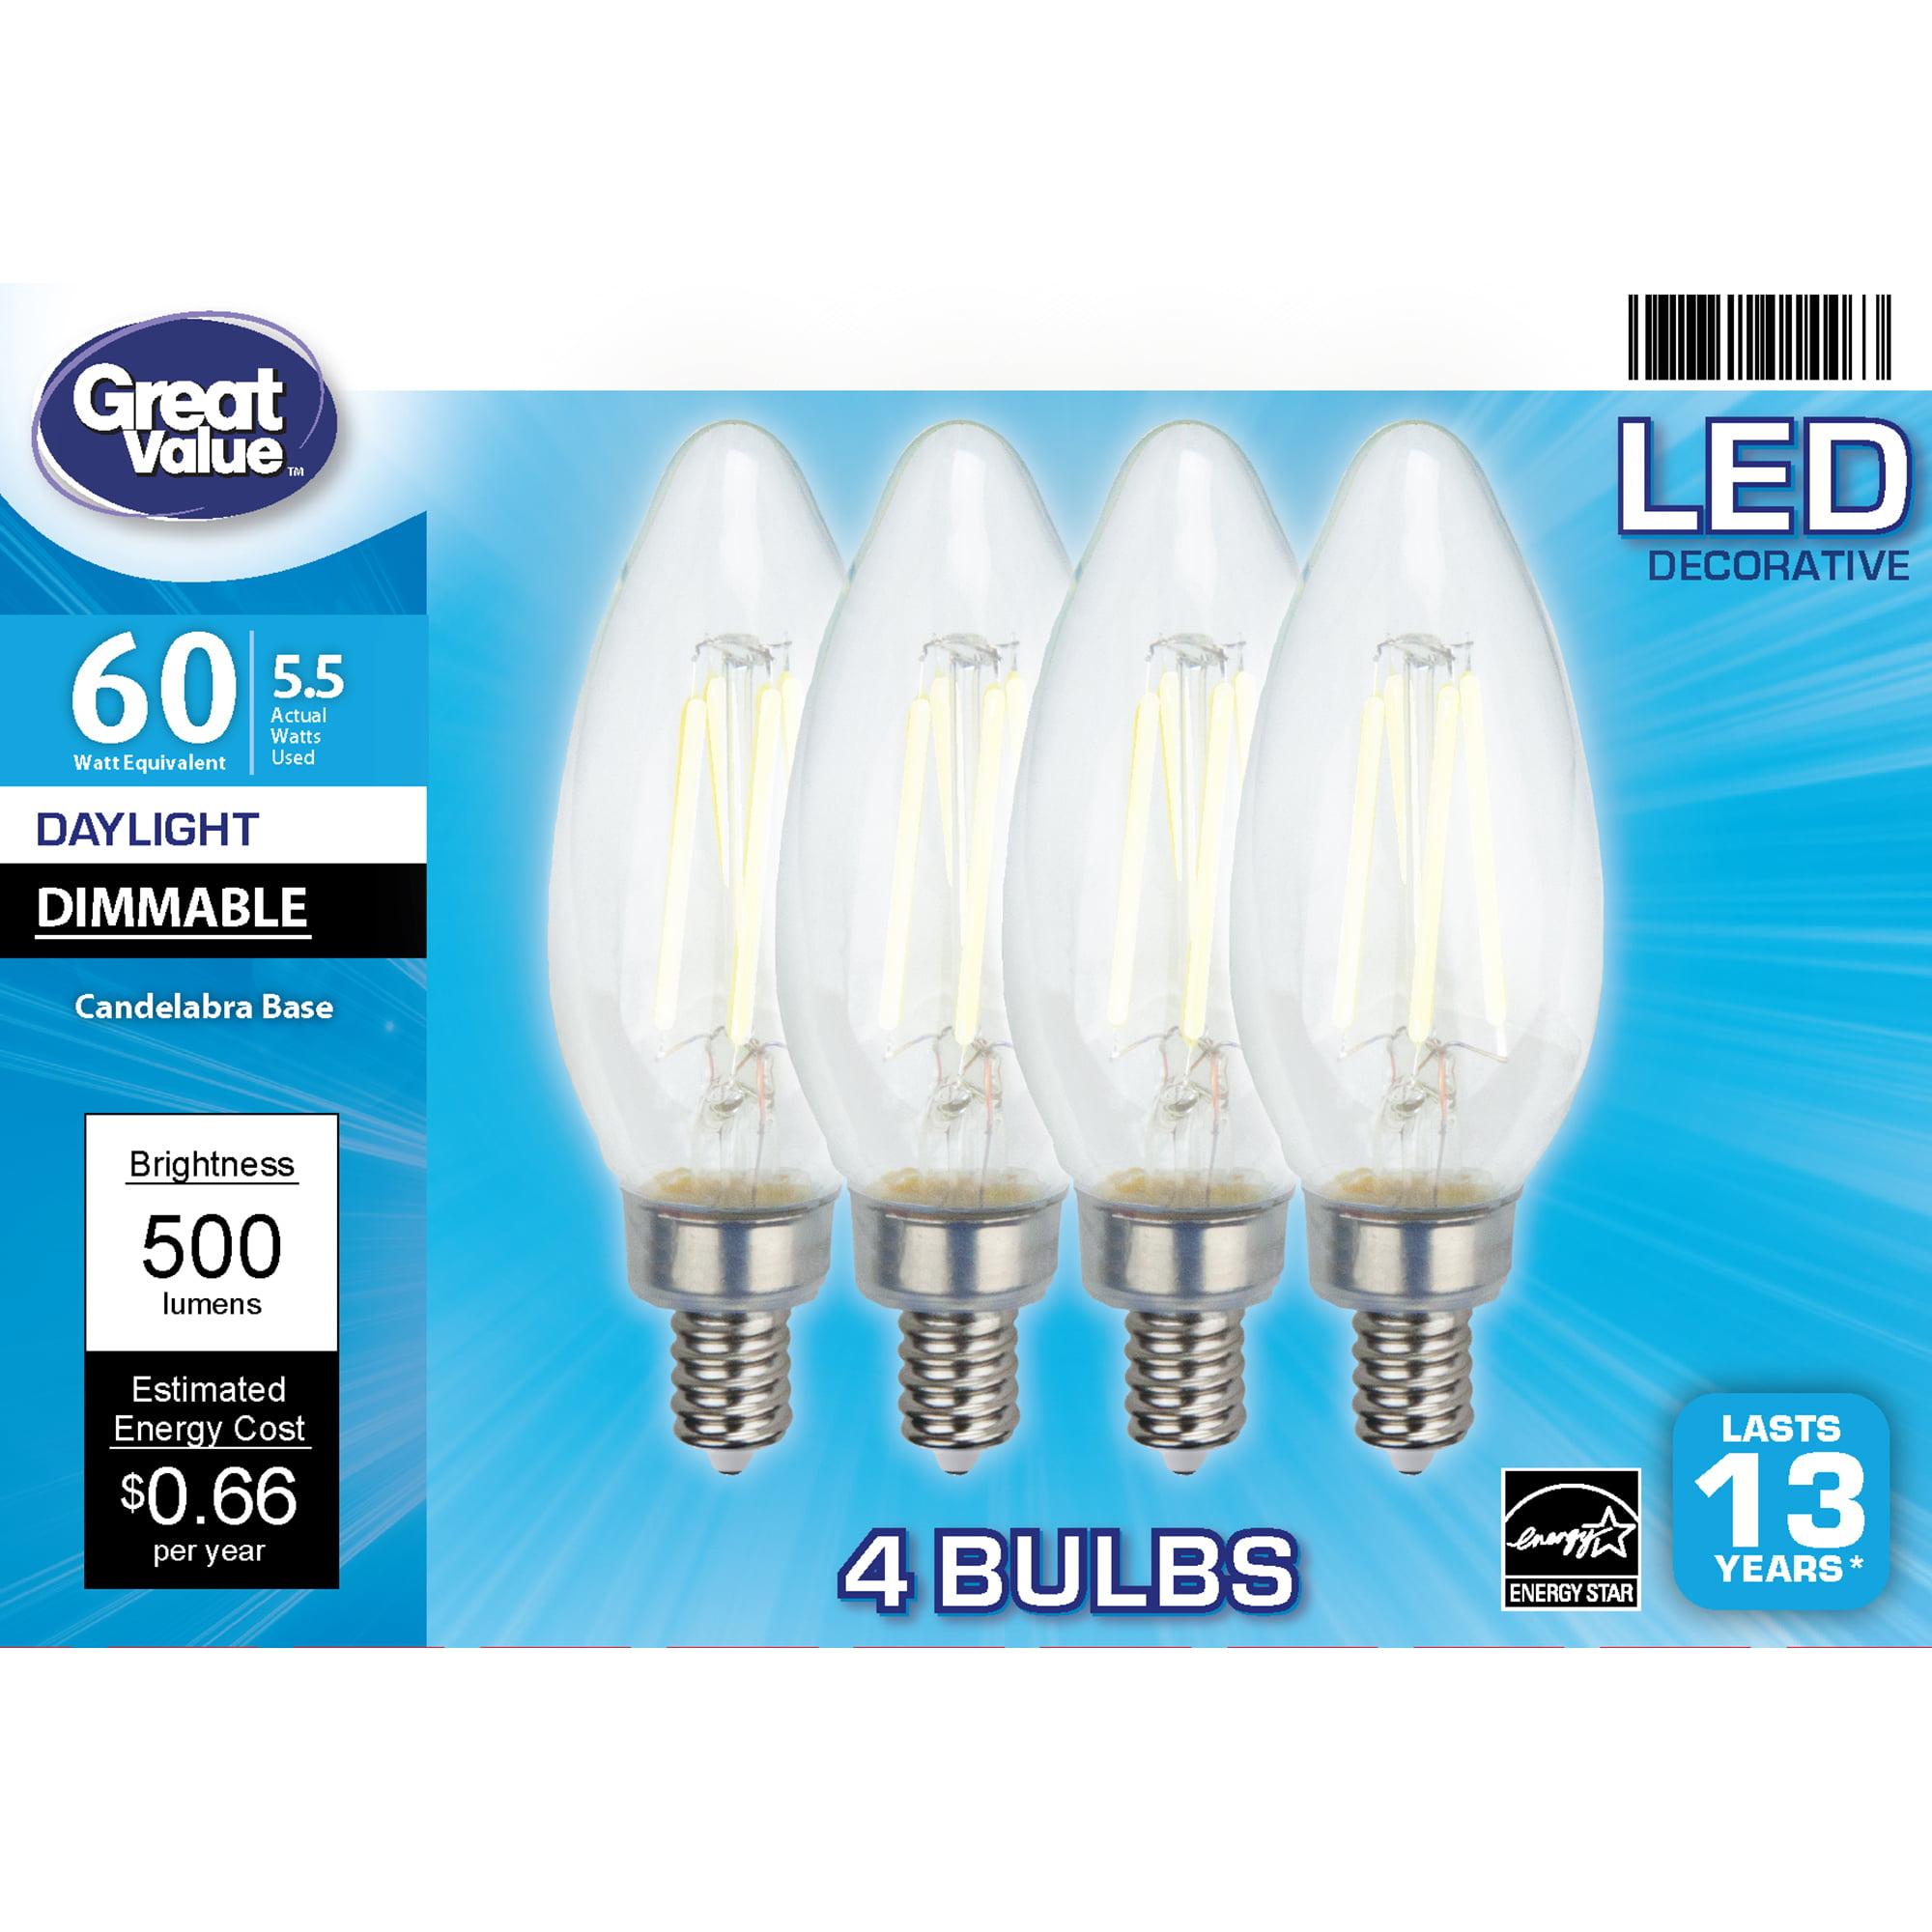 Great Value Led Light Bulb 5 5 Watts 60w Equivalent B10 Deco Lamp E12 Candelabra Base Dimmable Daylight 4 Pack Walmart Com Walmart Com